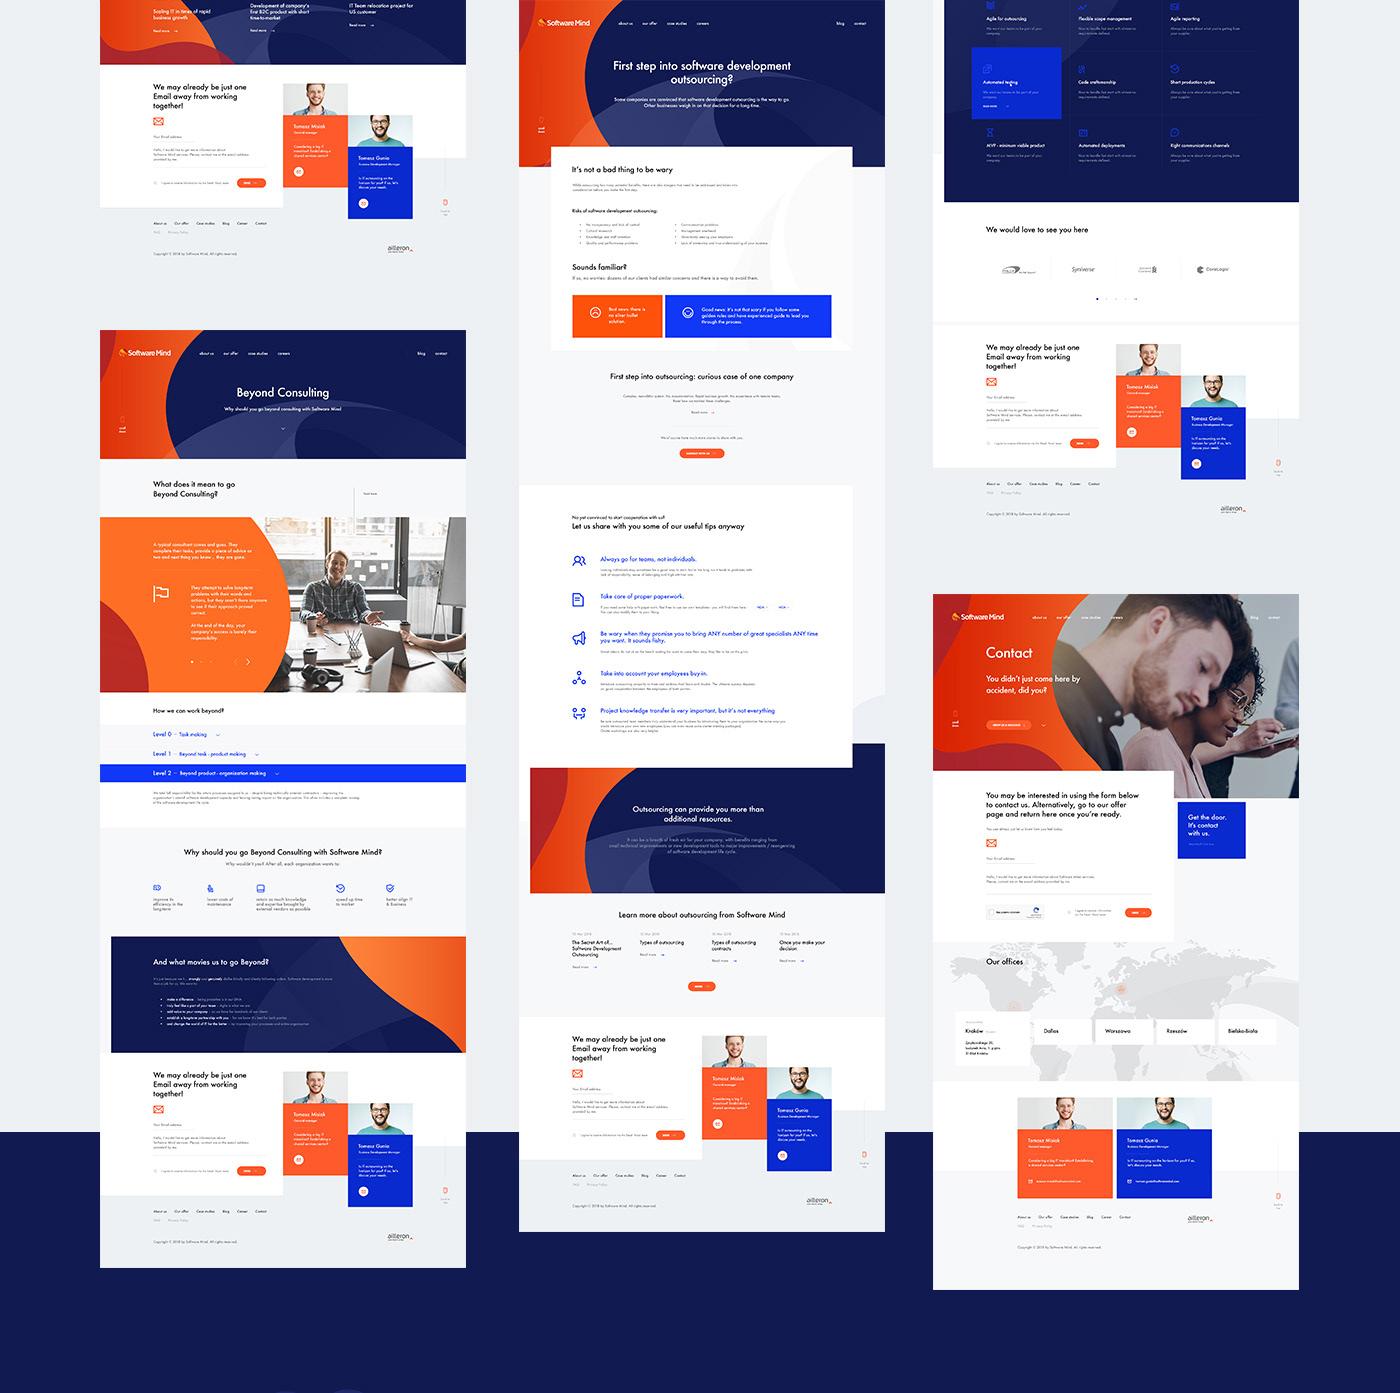 Web Design Process for Software Mind